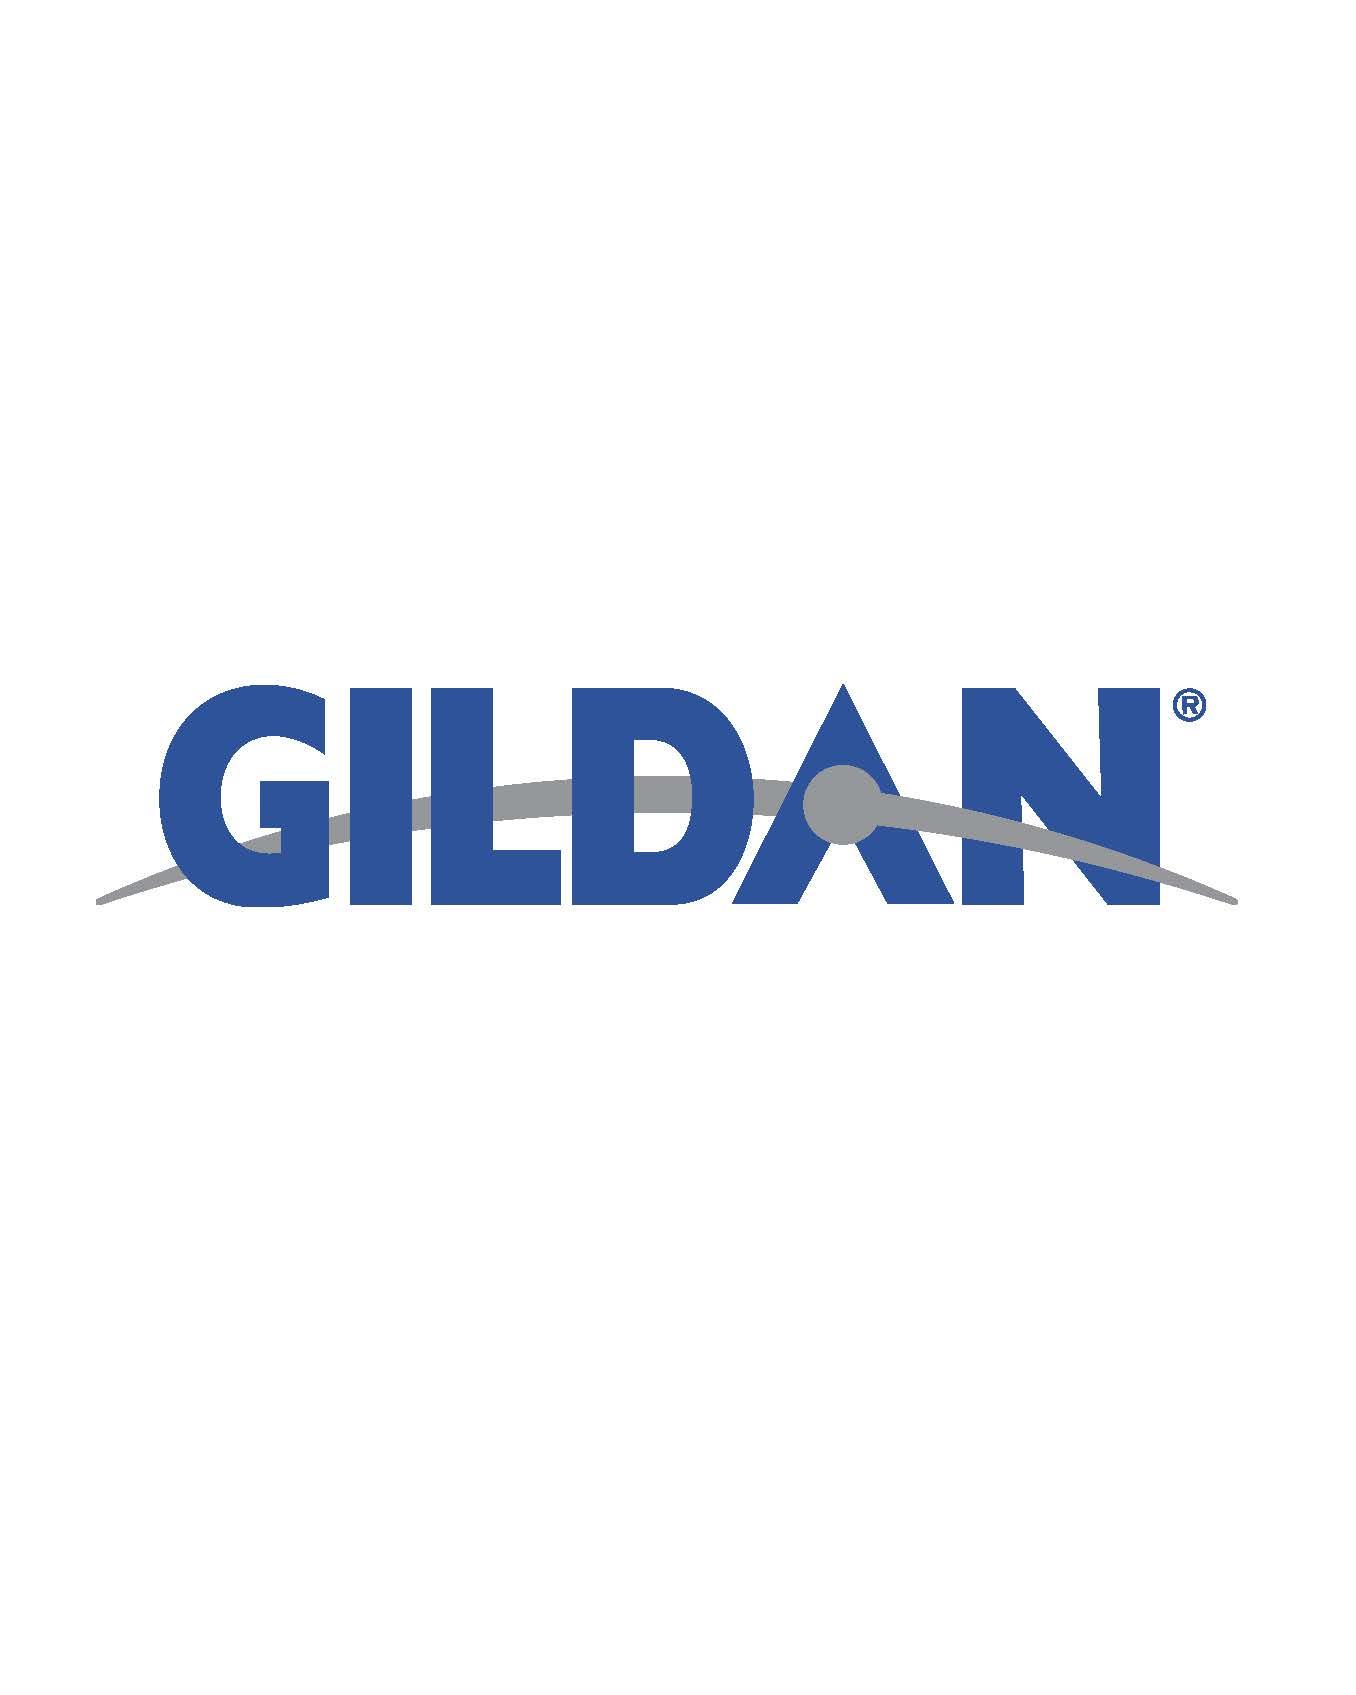 Promo Logos - Gildan.jpg